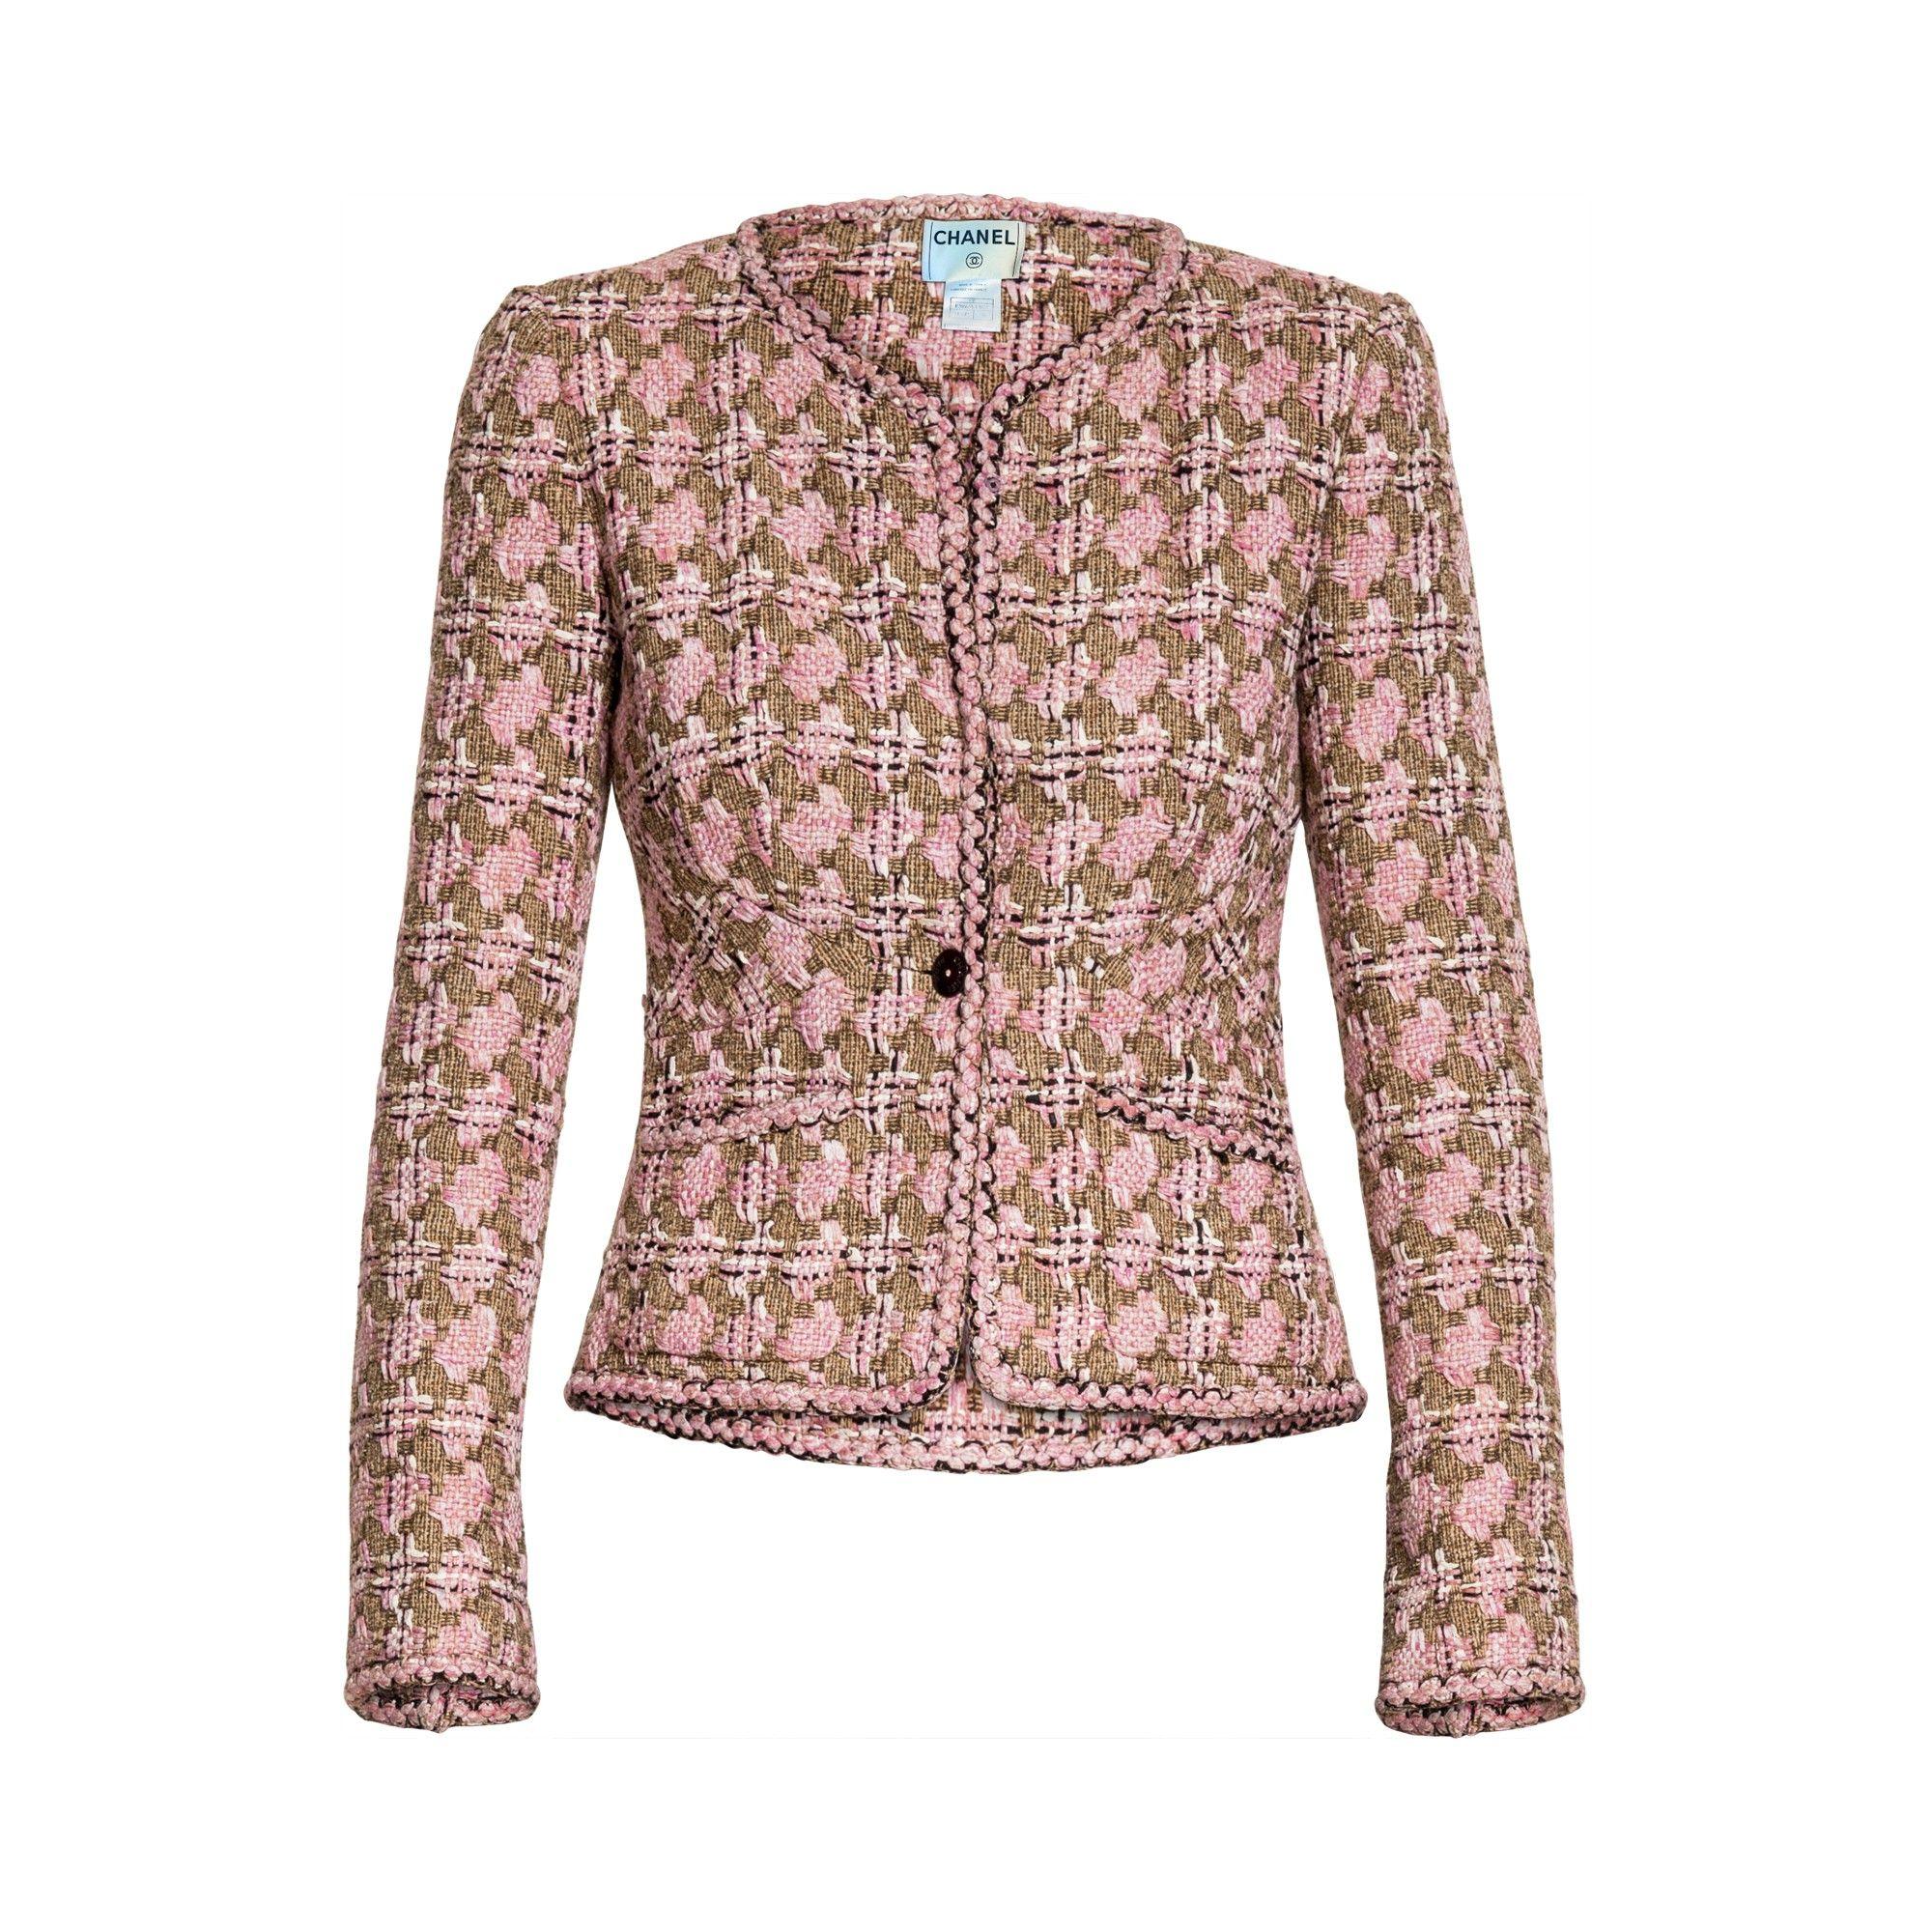 Pin By Rachel Amidei On Abiti Vintage Designer Jackets Chanel Jacket Clothes